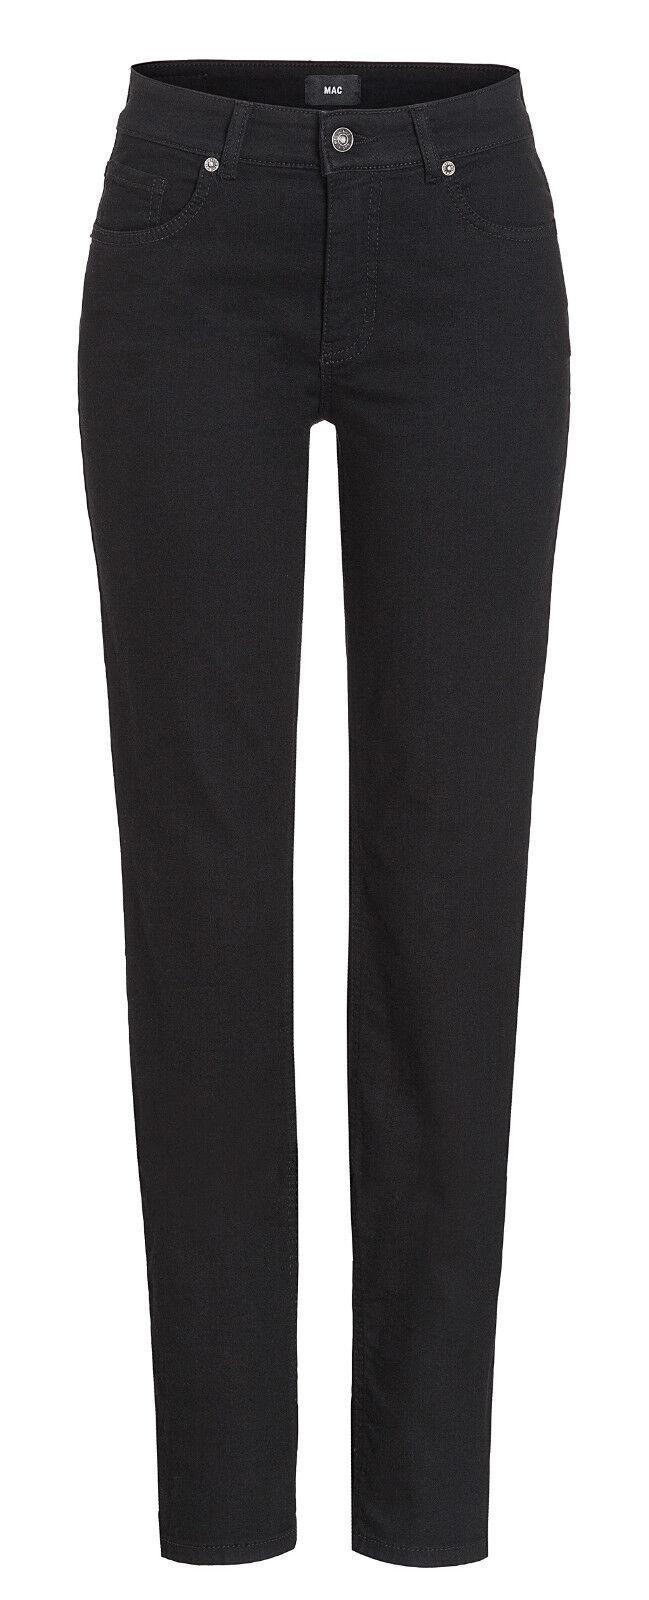 MAC Damen Jeans Melanie 5040 NEU schwarz D999 Alle Größen Längen